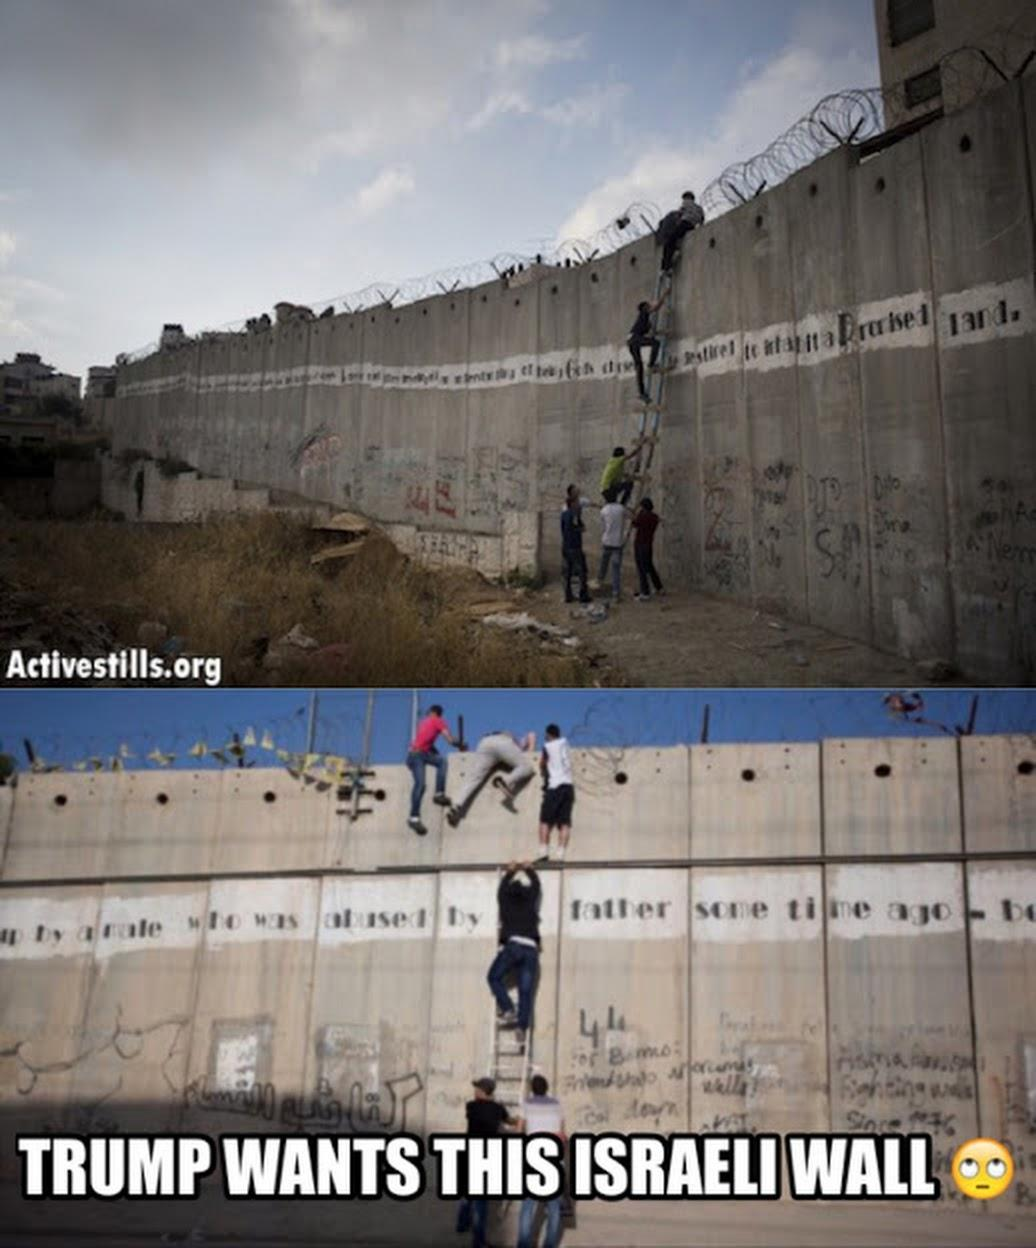 Donald trumps failed wall idea